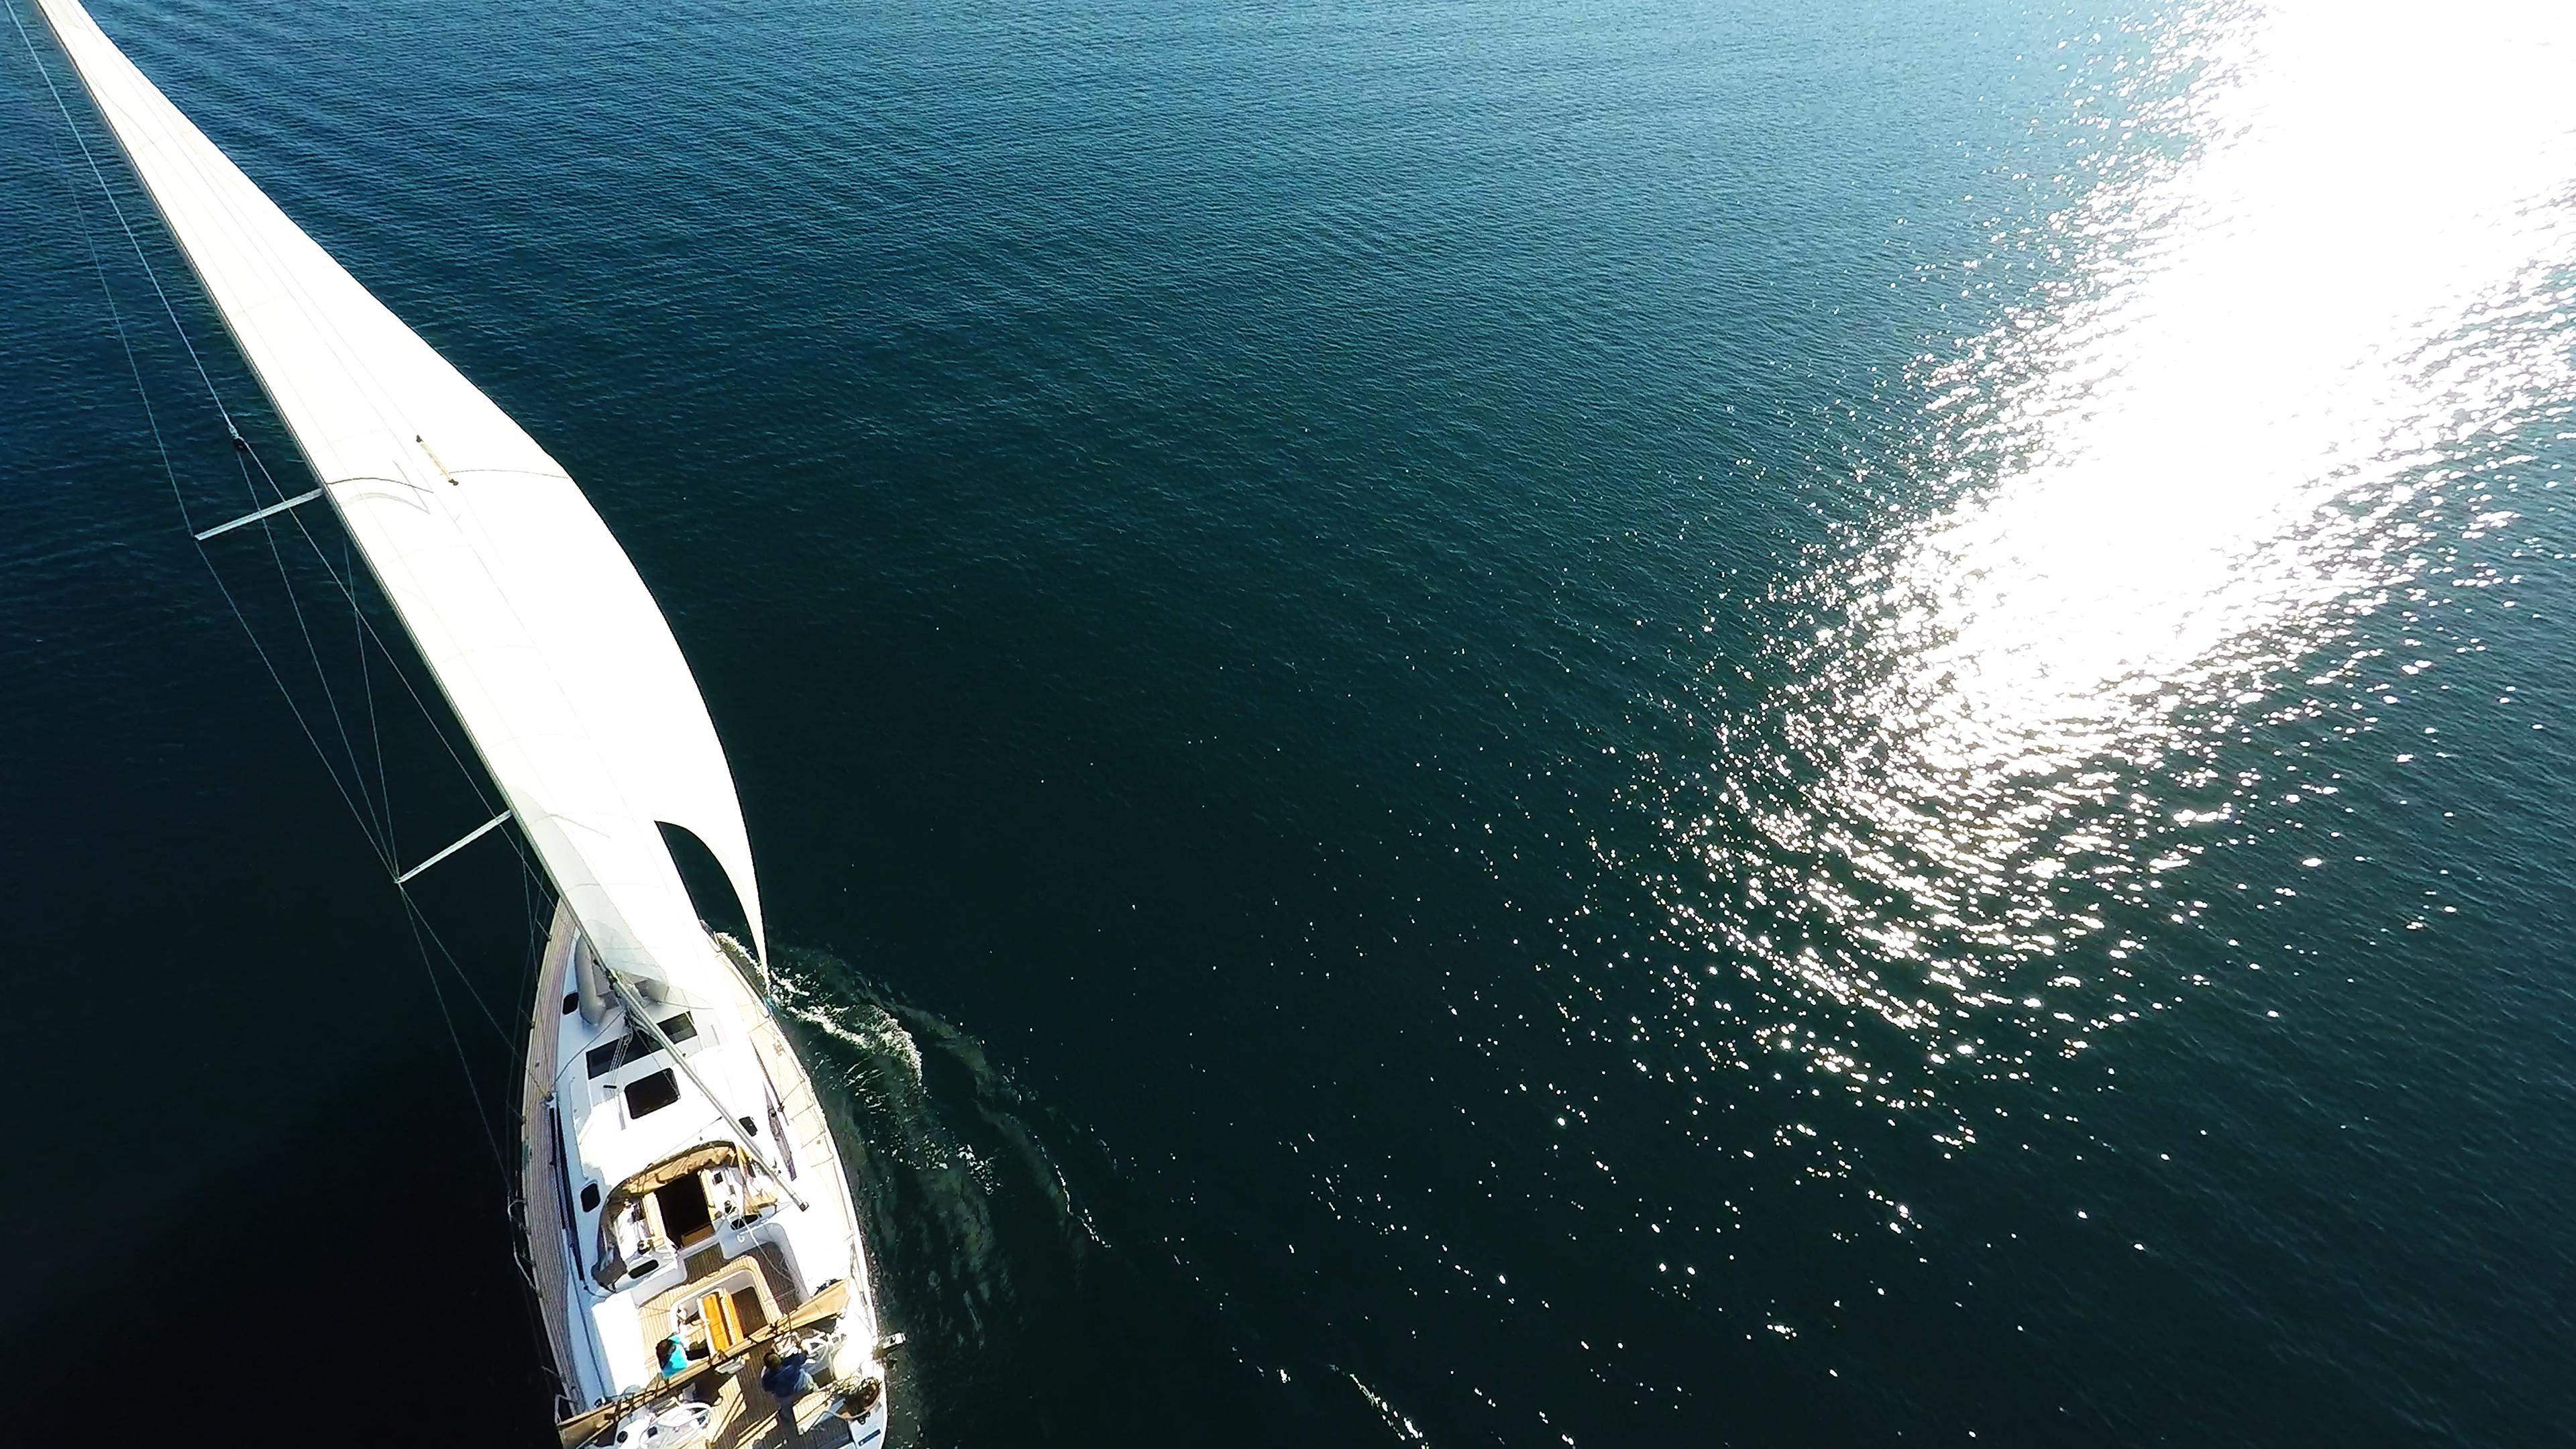 barcha a vela mare blu riflesso del sole barca a vela elan 45 impression yacht a vela